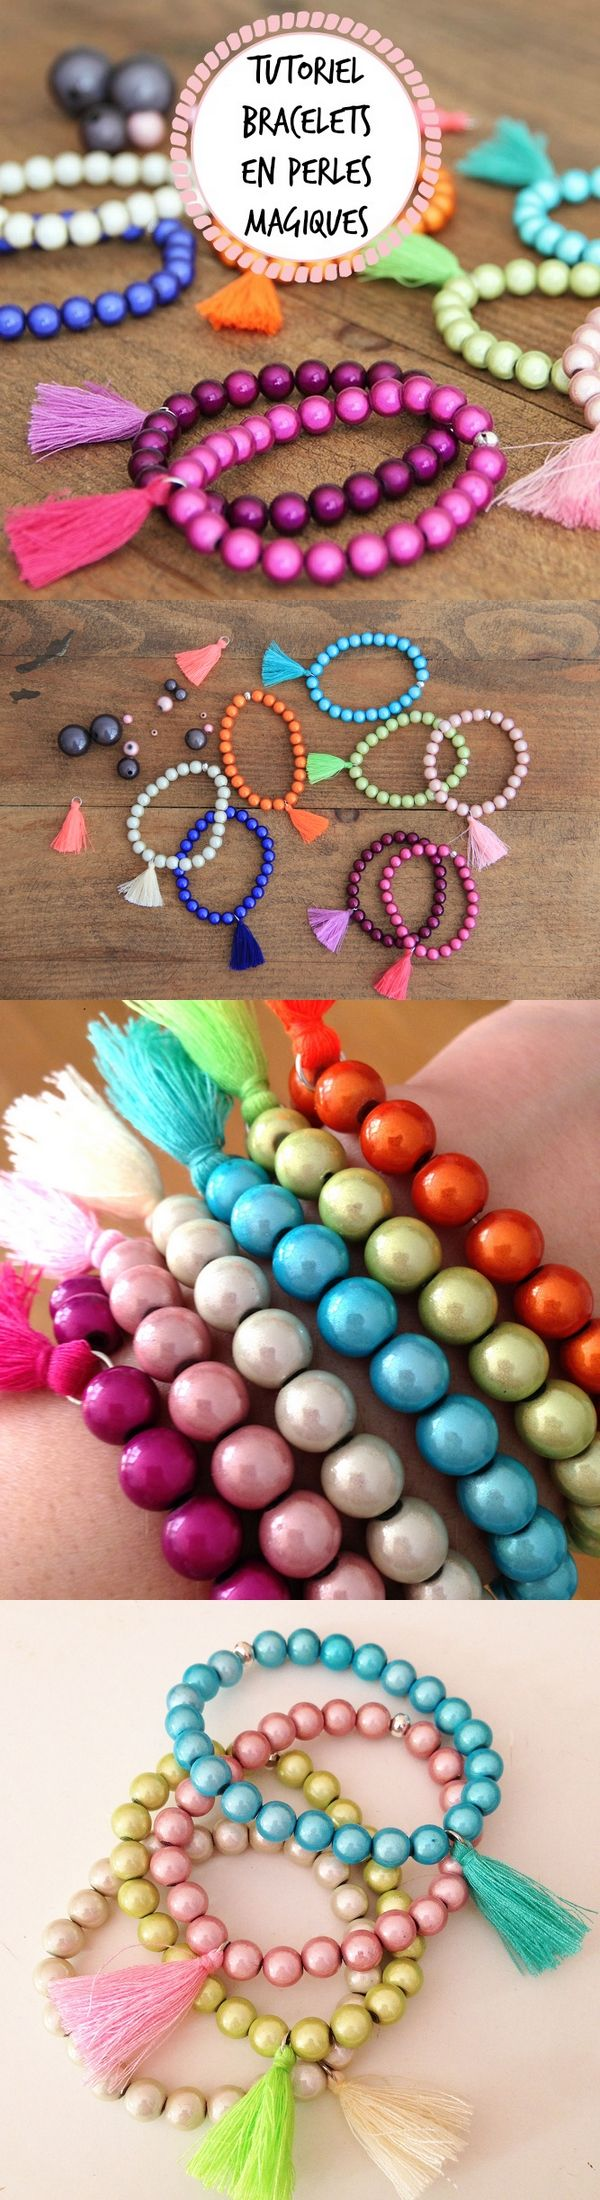 tuto jolis bracelets faciles en perles magiques pinterest